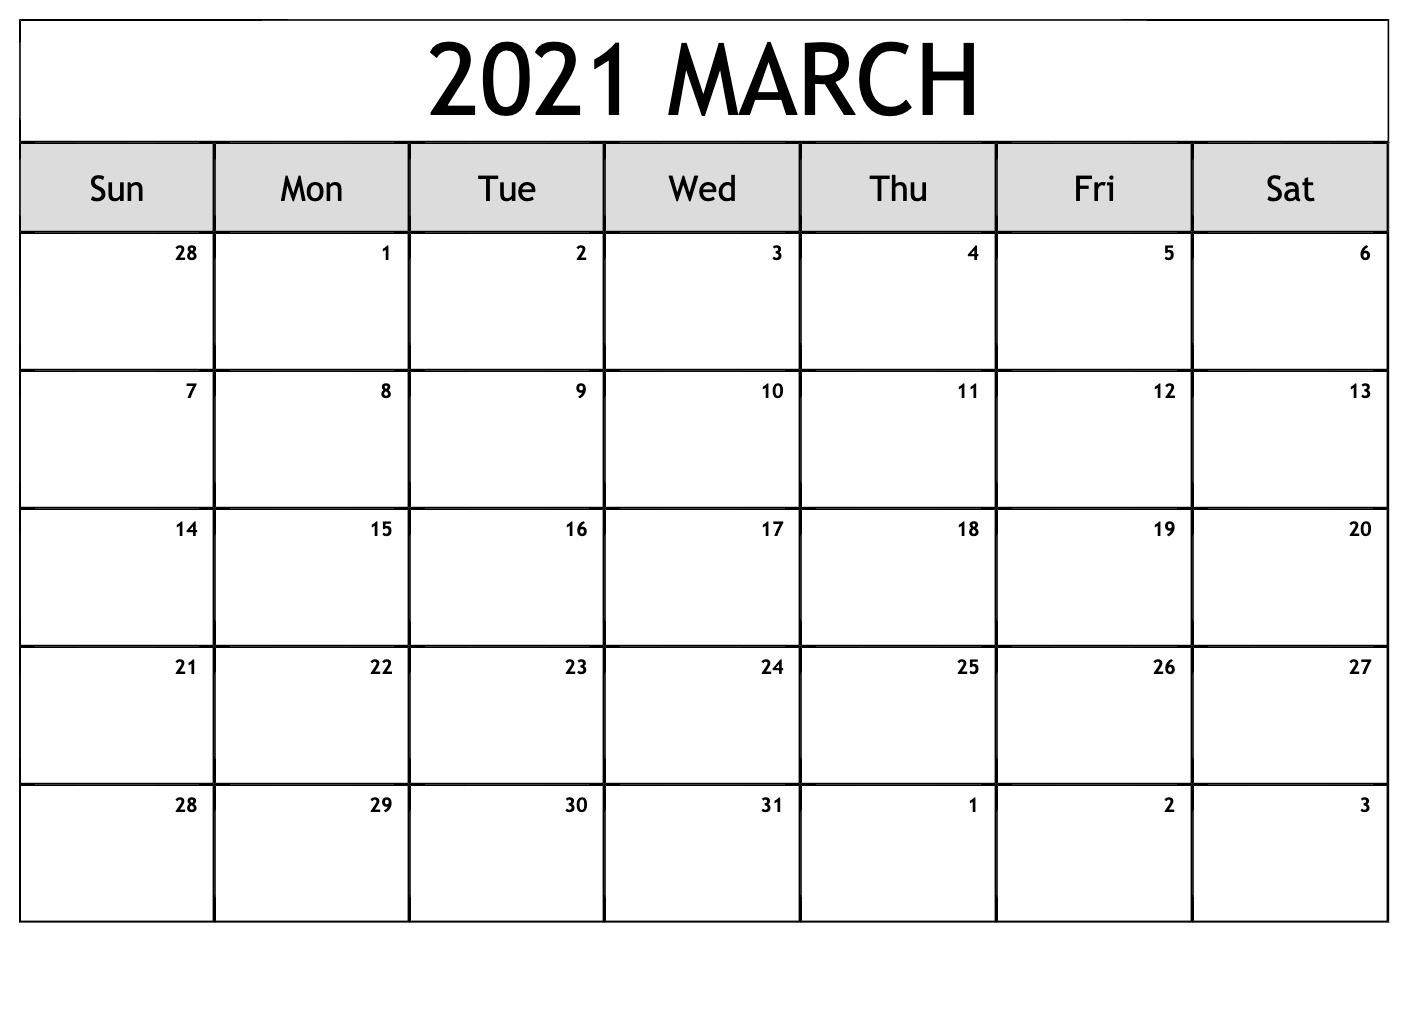 March 2021 Calendar Cute Pdf Template – Free Printable Inside March 2021 Calendar Images